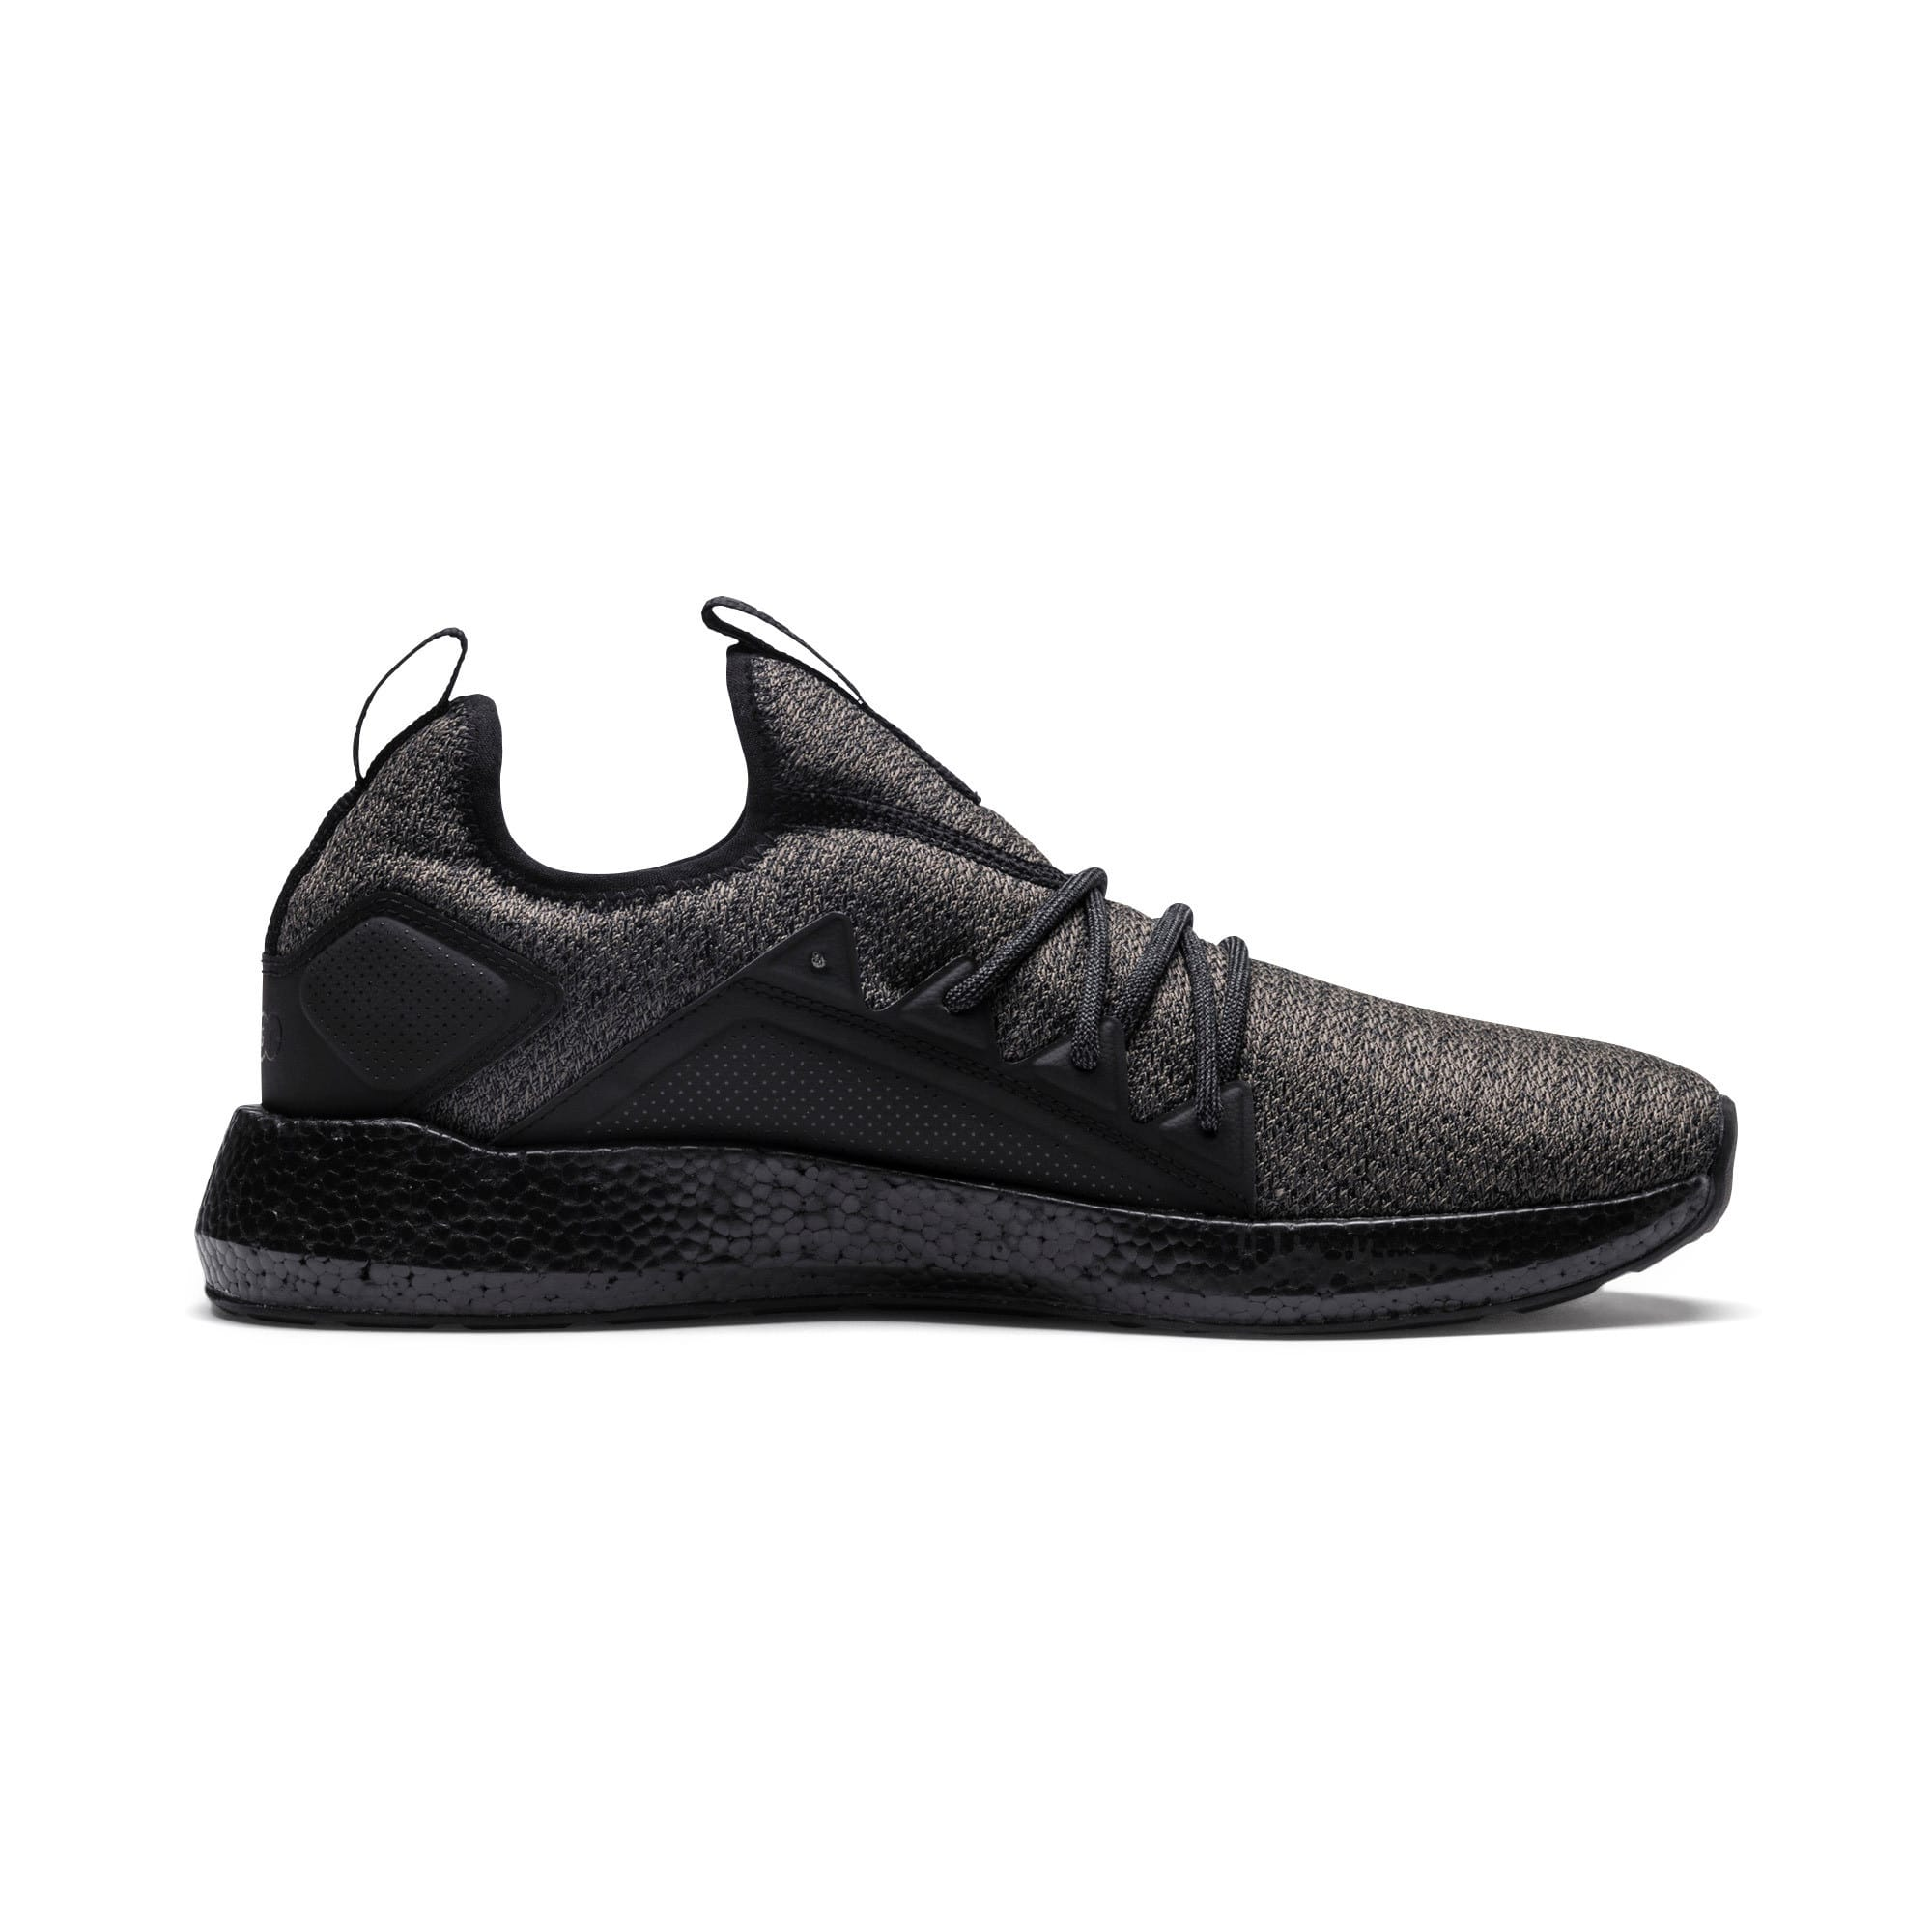 Thumbnail 5 of NRGY Neko Knit Men's Running Shoes, Puma Black-Puma Black, medium